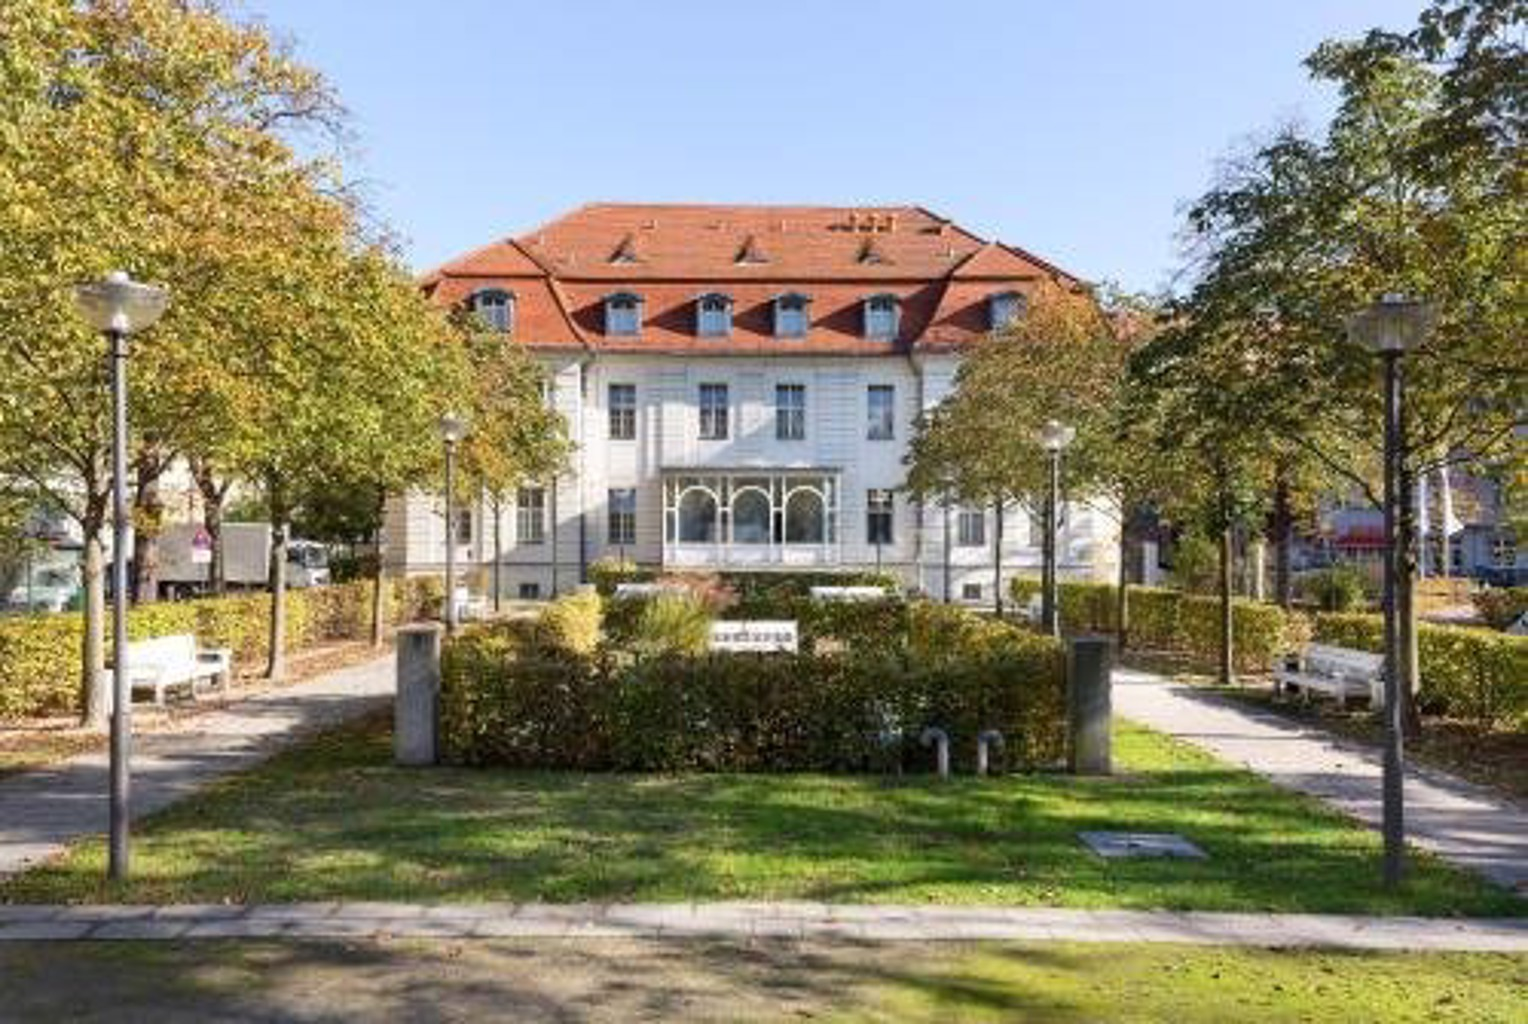 Hotel Axel Springer